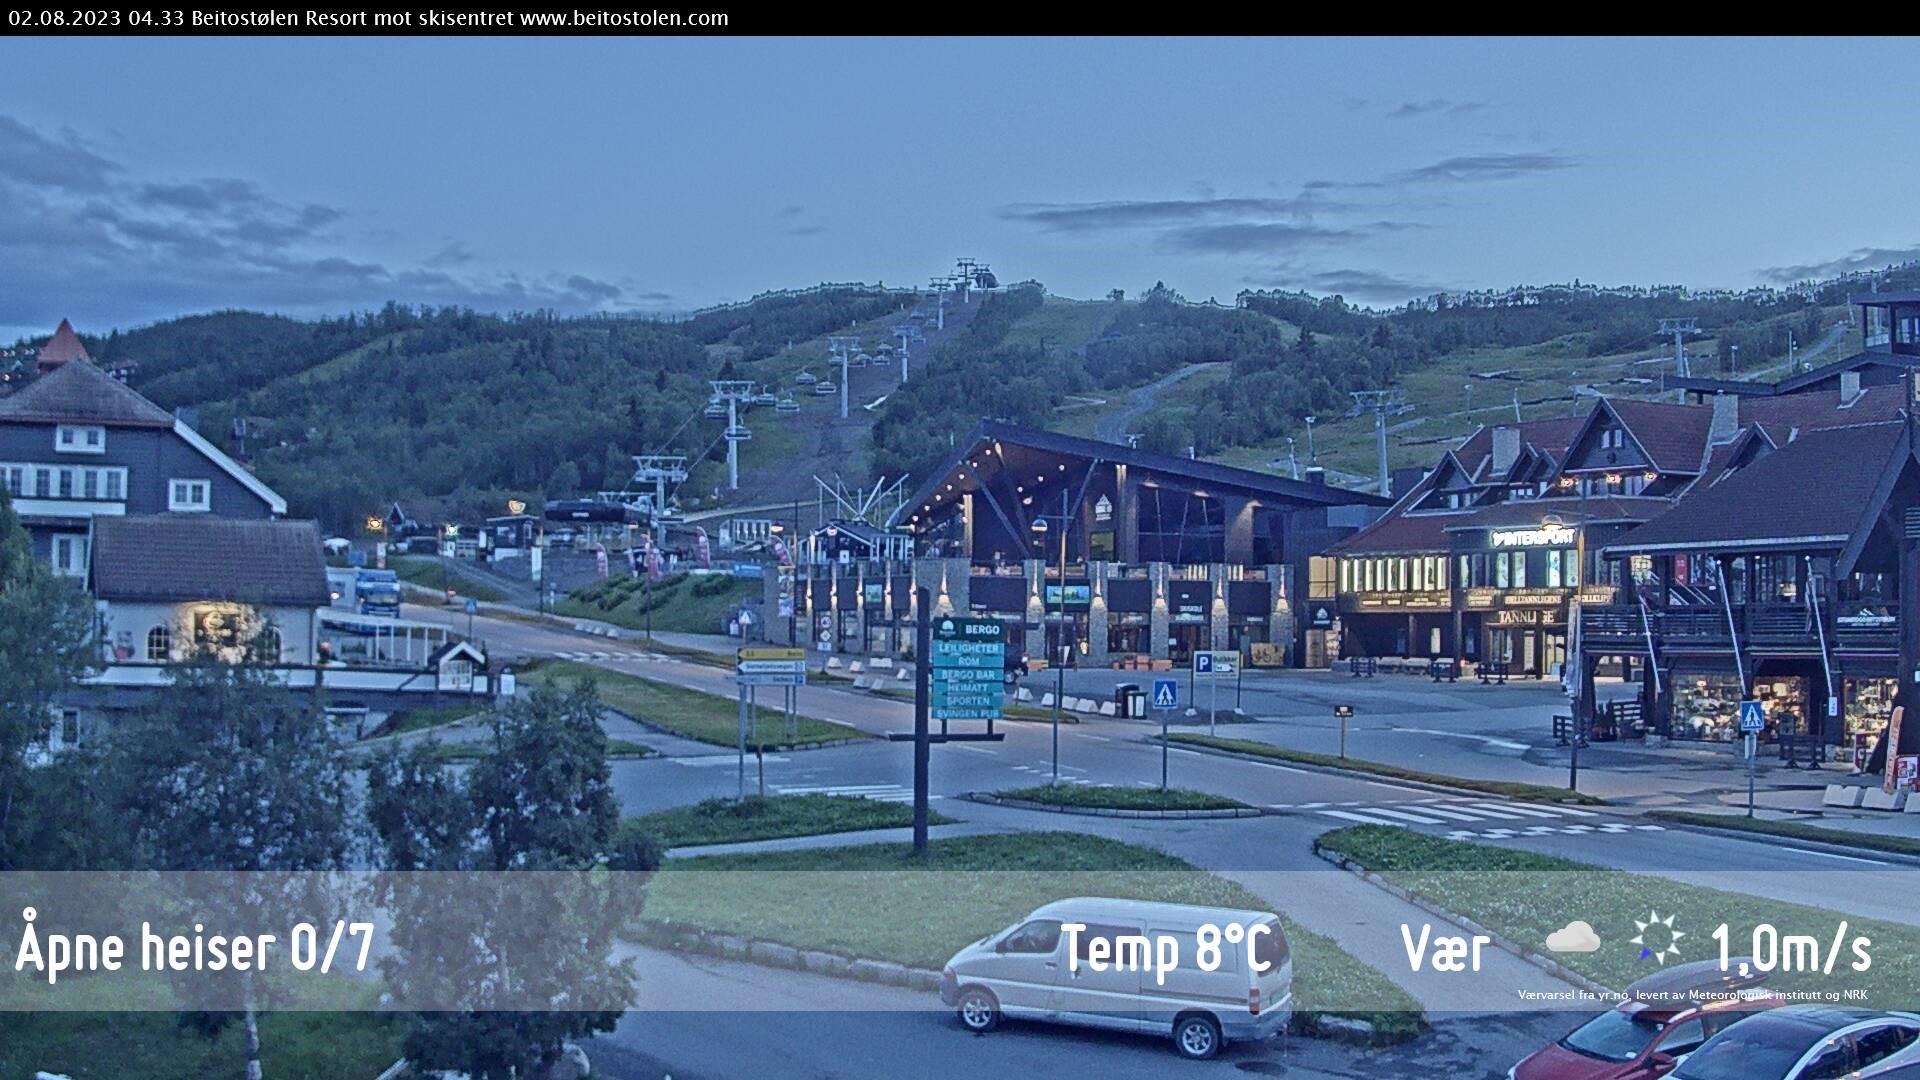 Webcam de la Estación de Esquí de Beitostølen